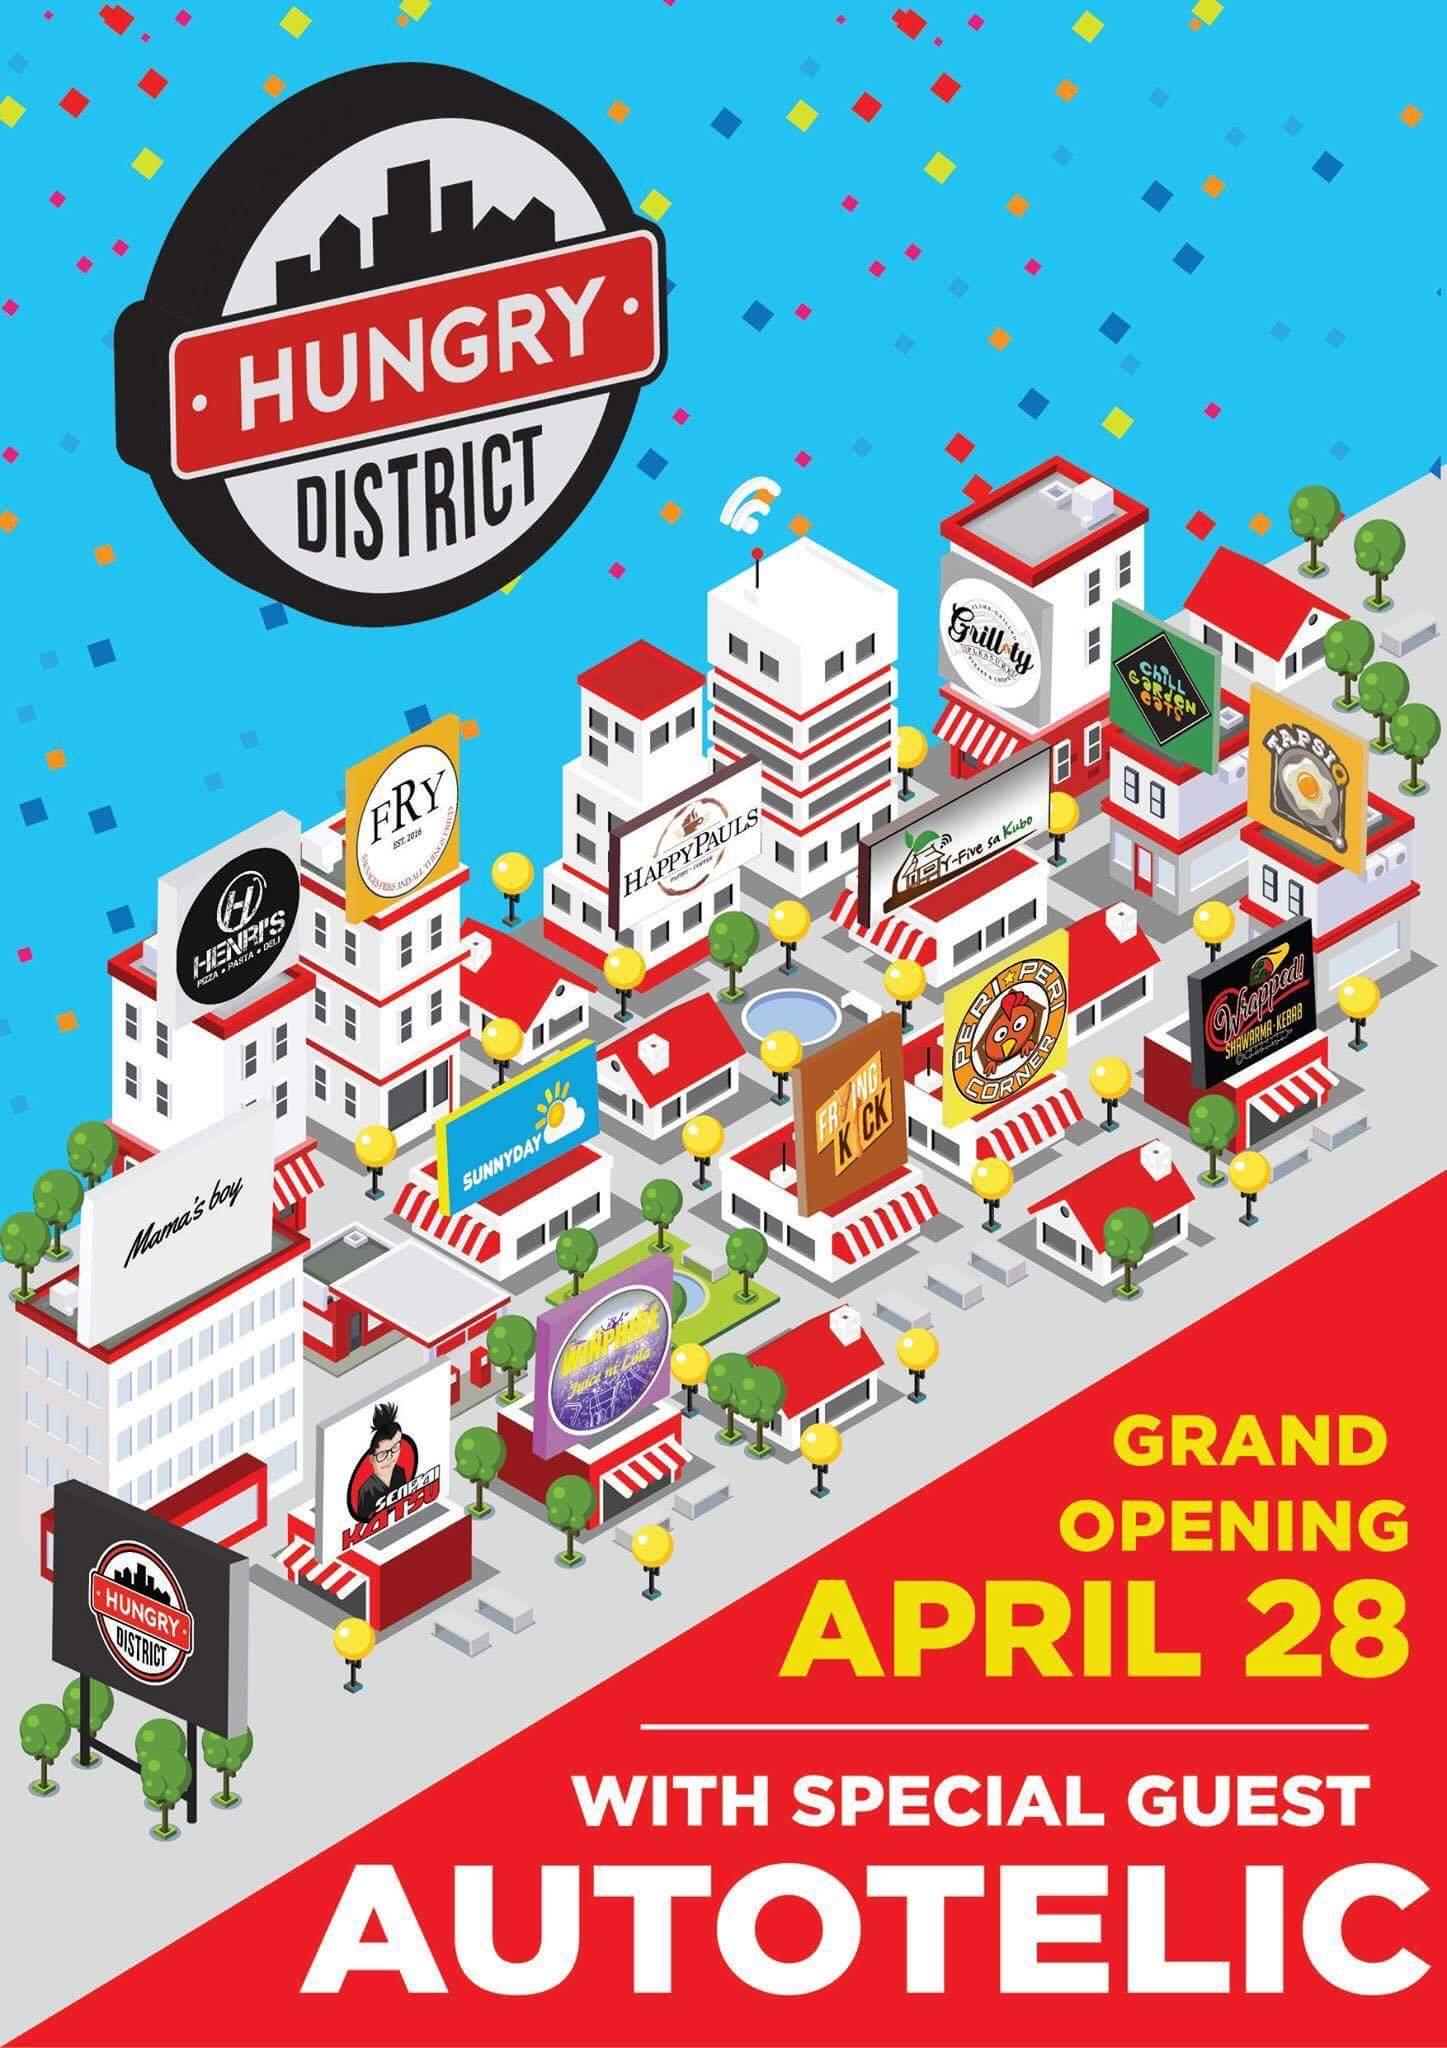 The Hungry District Food Hub